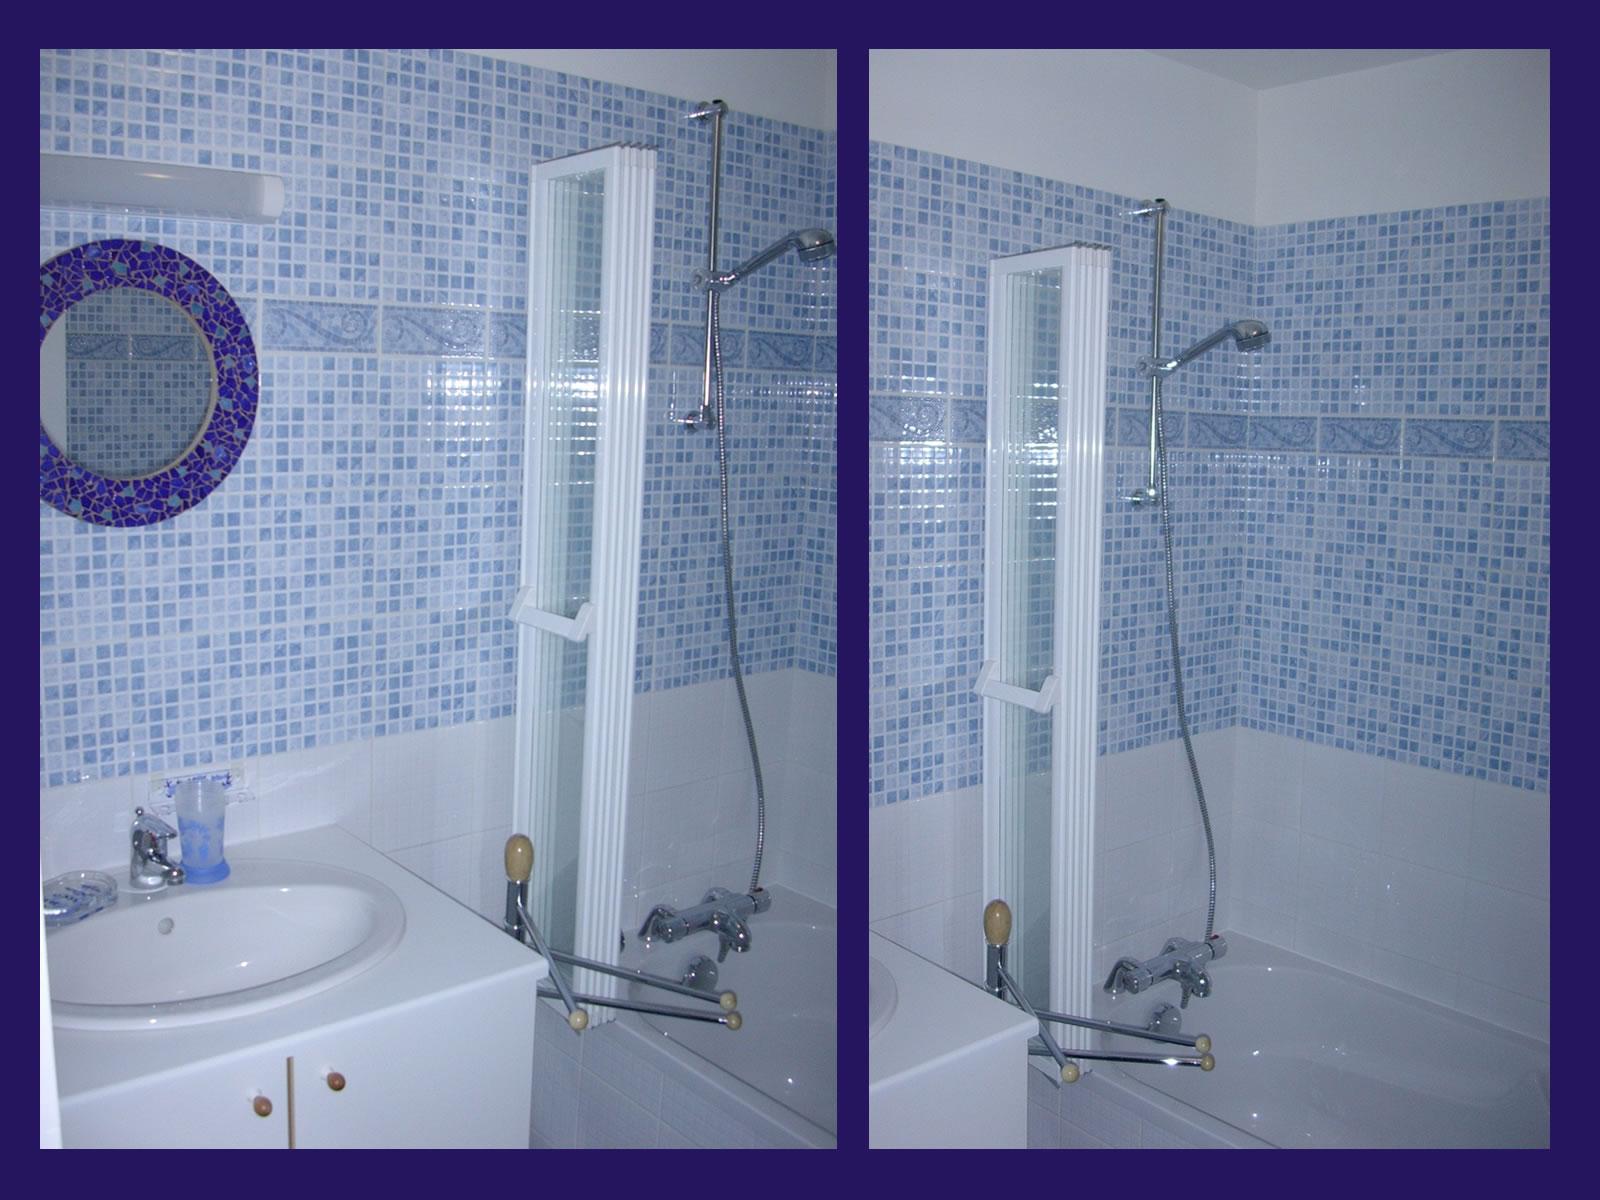 Image n°9 du gîte de mer : Salle de bain